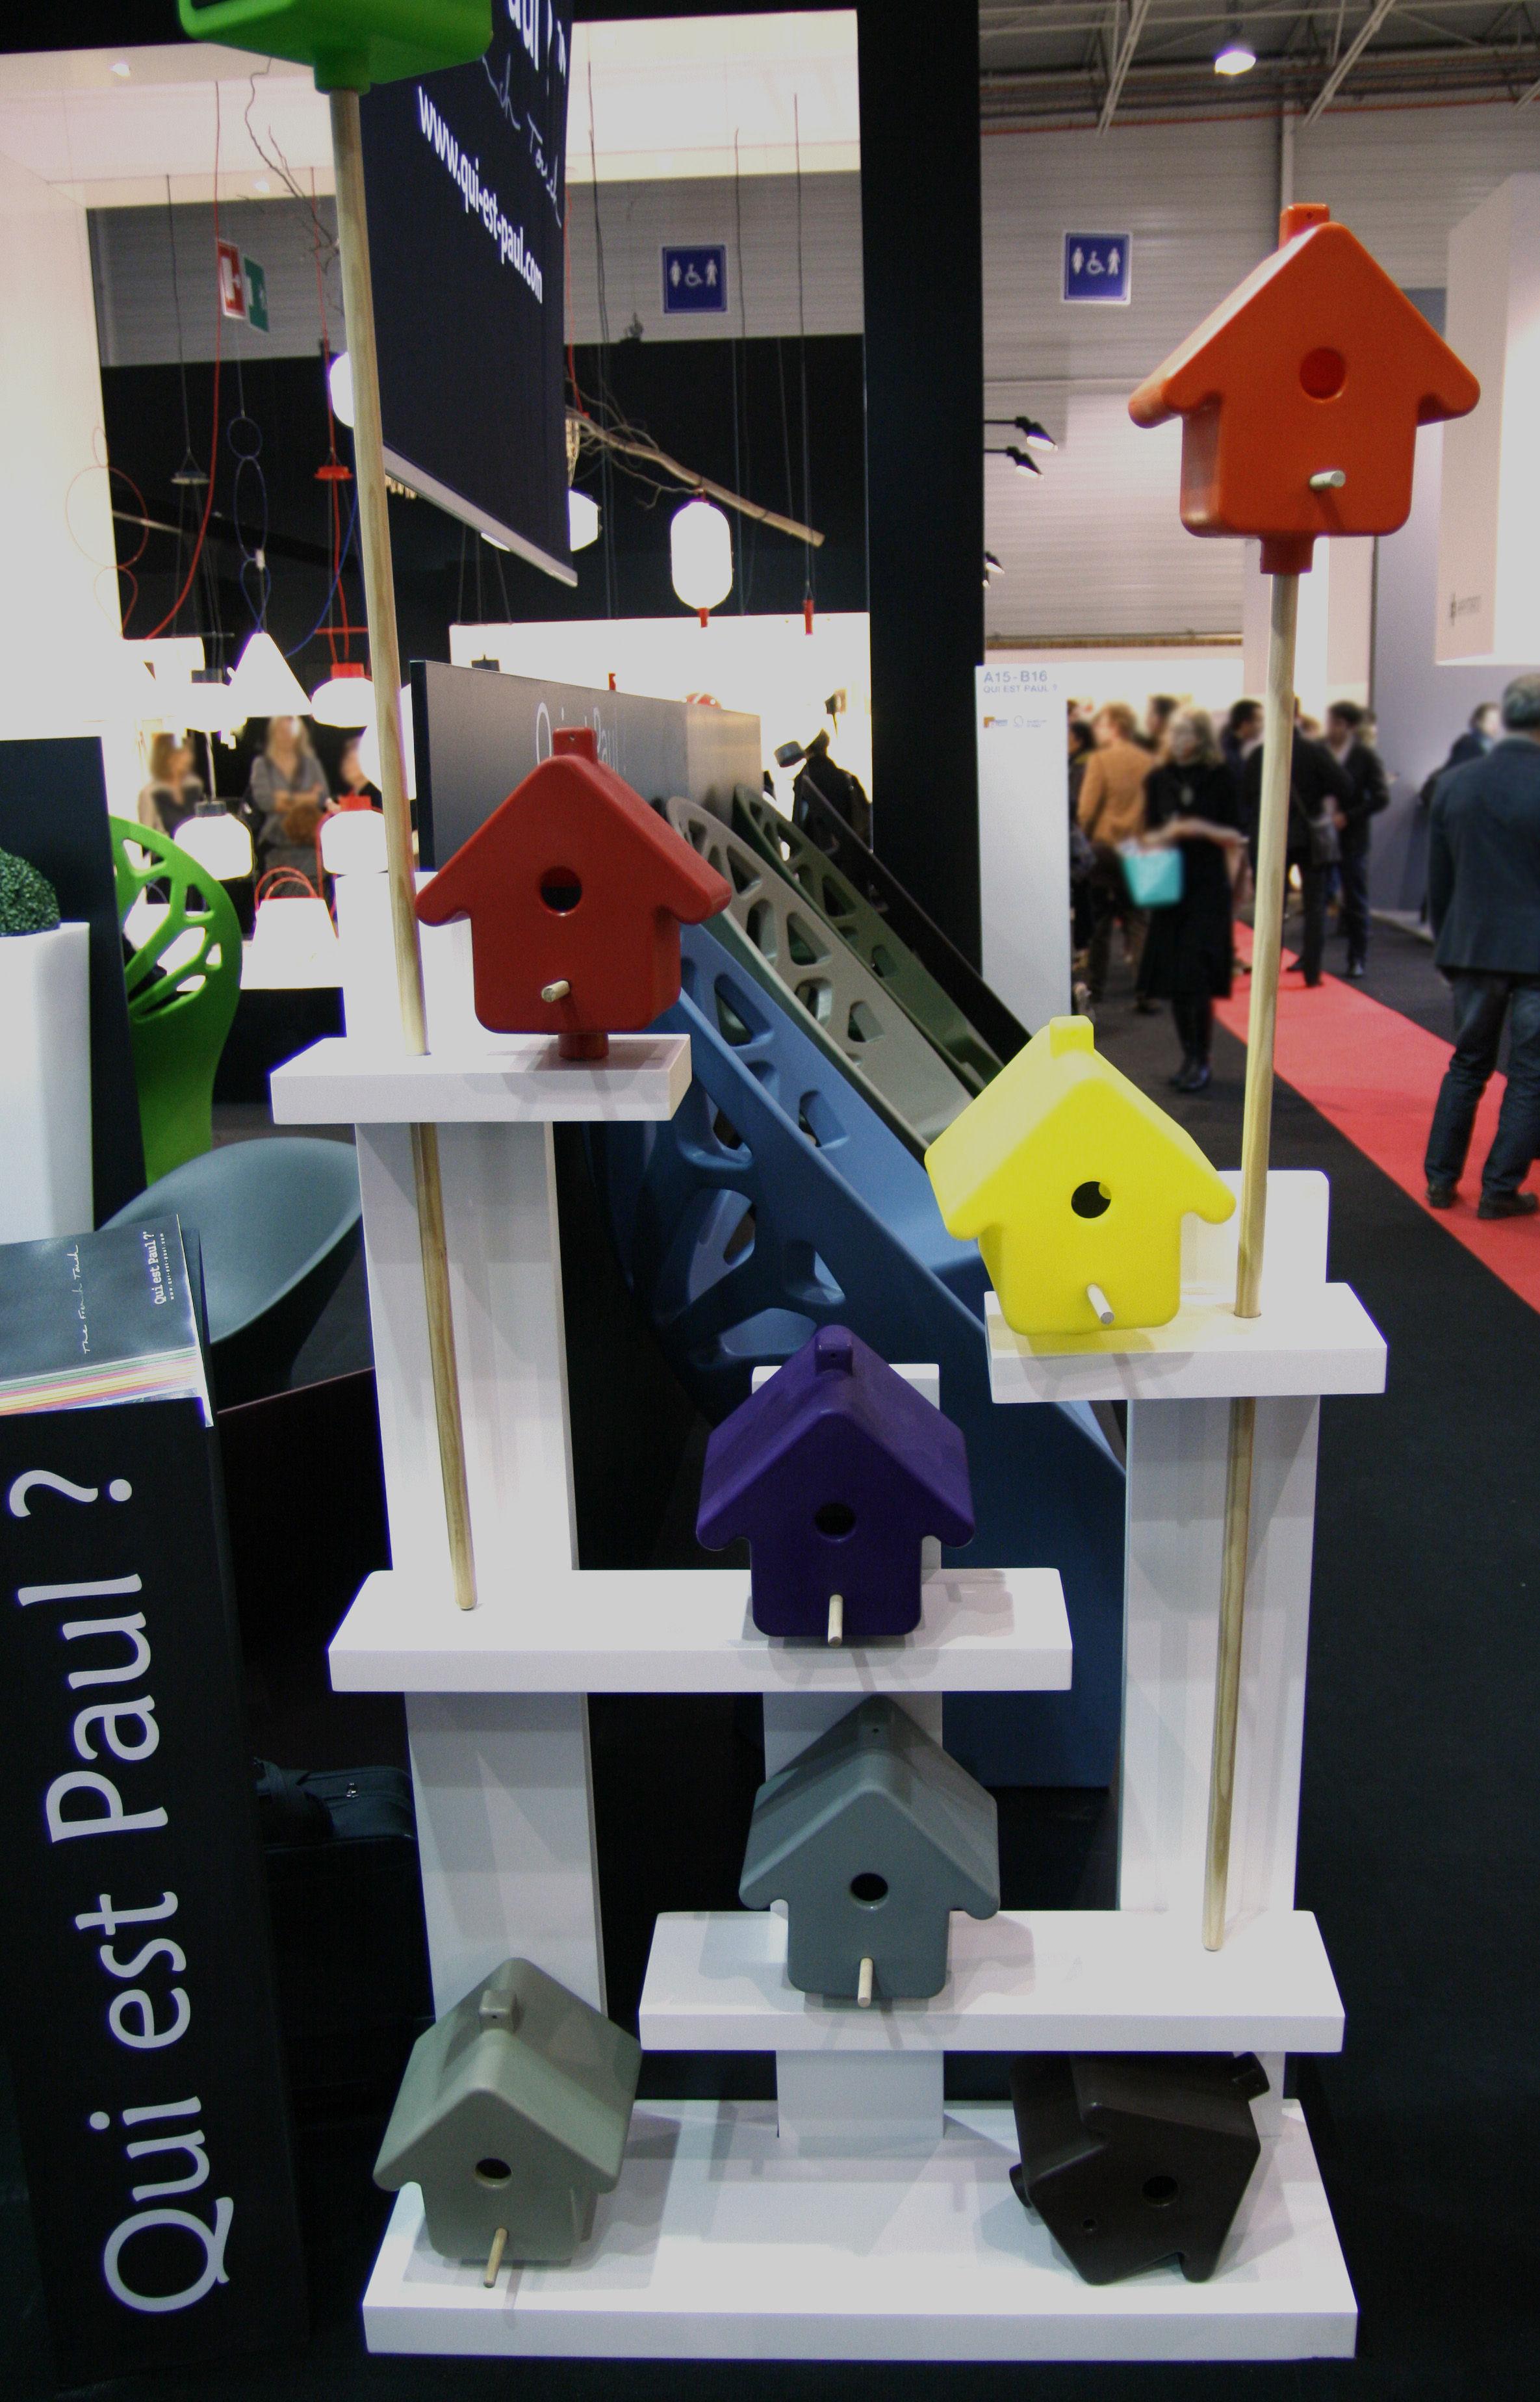 picto nichoir to hang beige by qui est paul. Black Bedroom Furniture Sets. Home Design Ideas